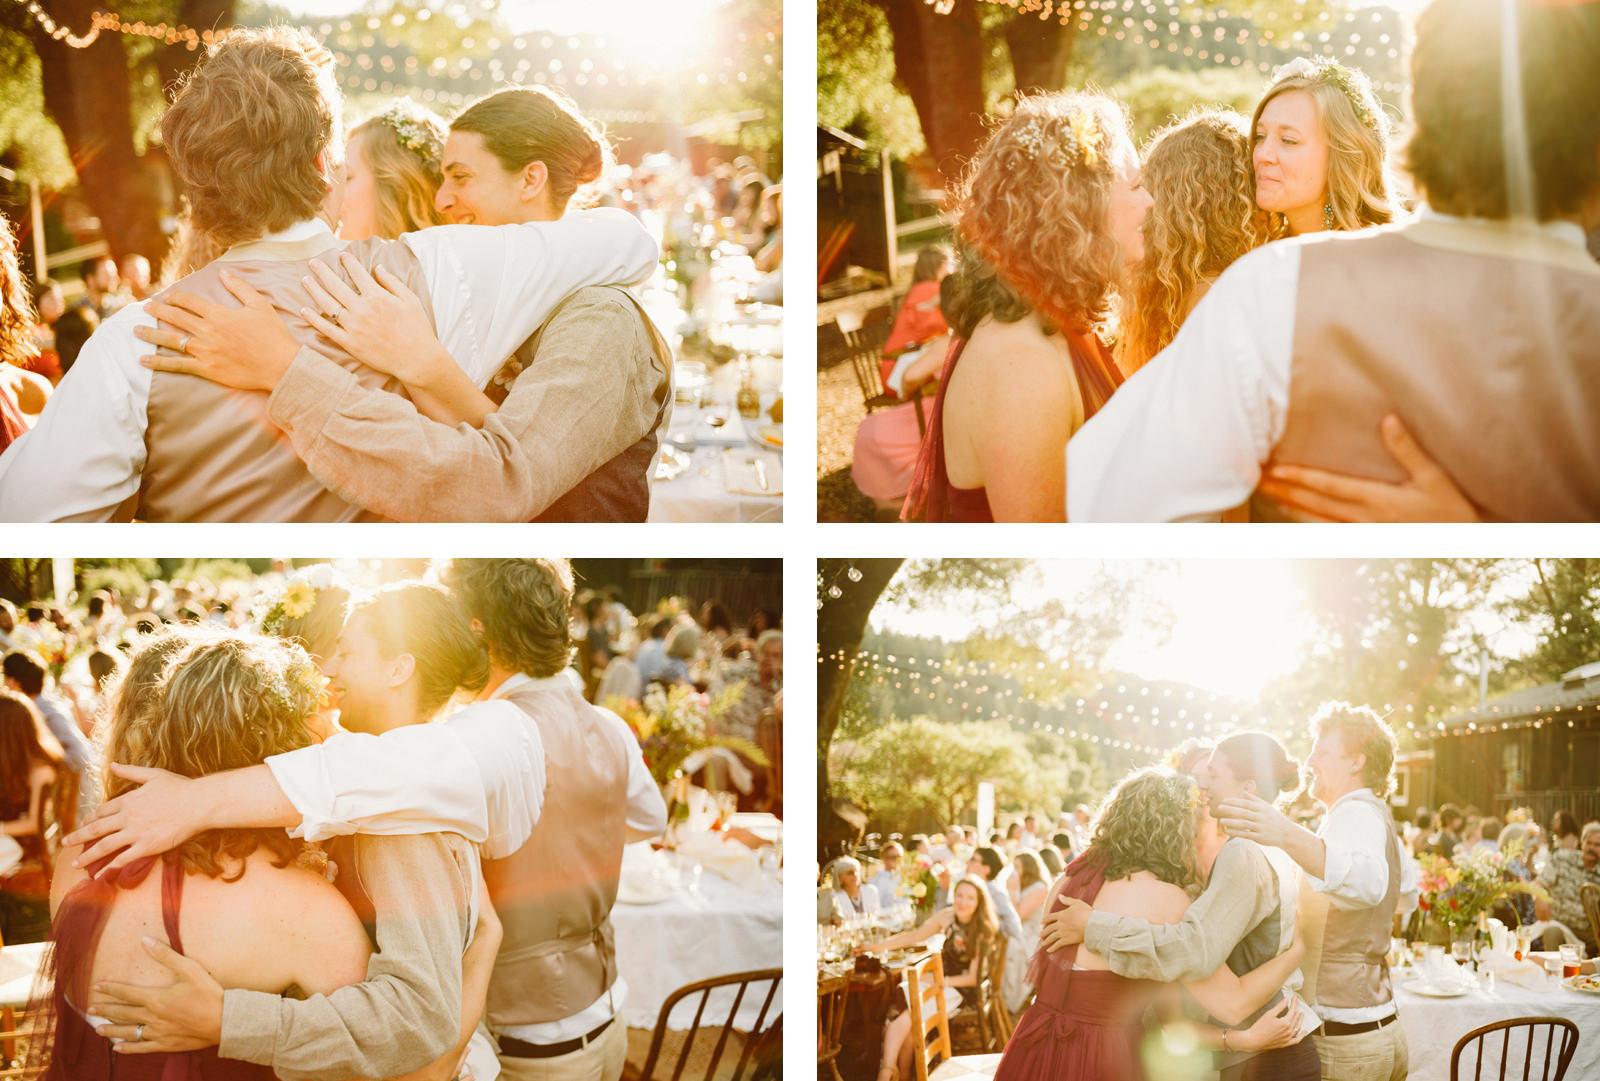 rivers-bend-retreat-wedding-087 RIVER'S BEND RETREAT WEDDING